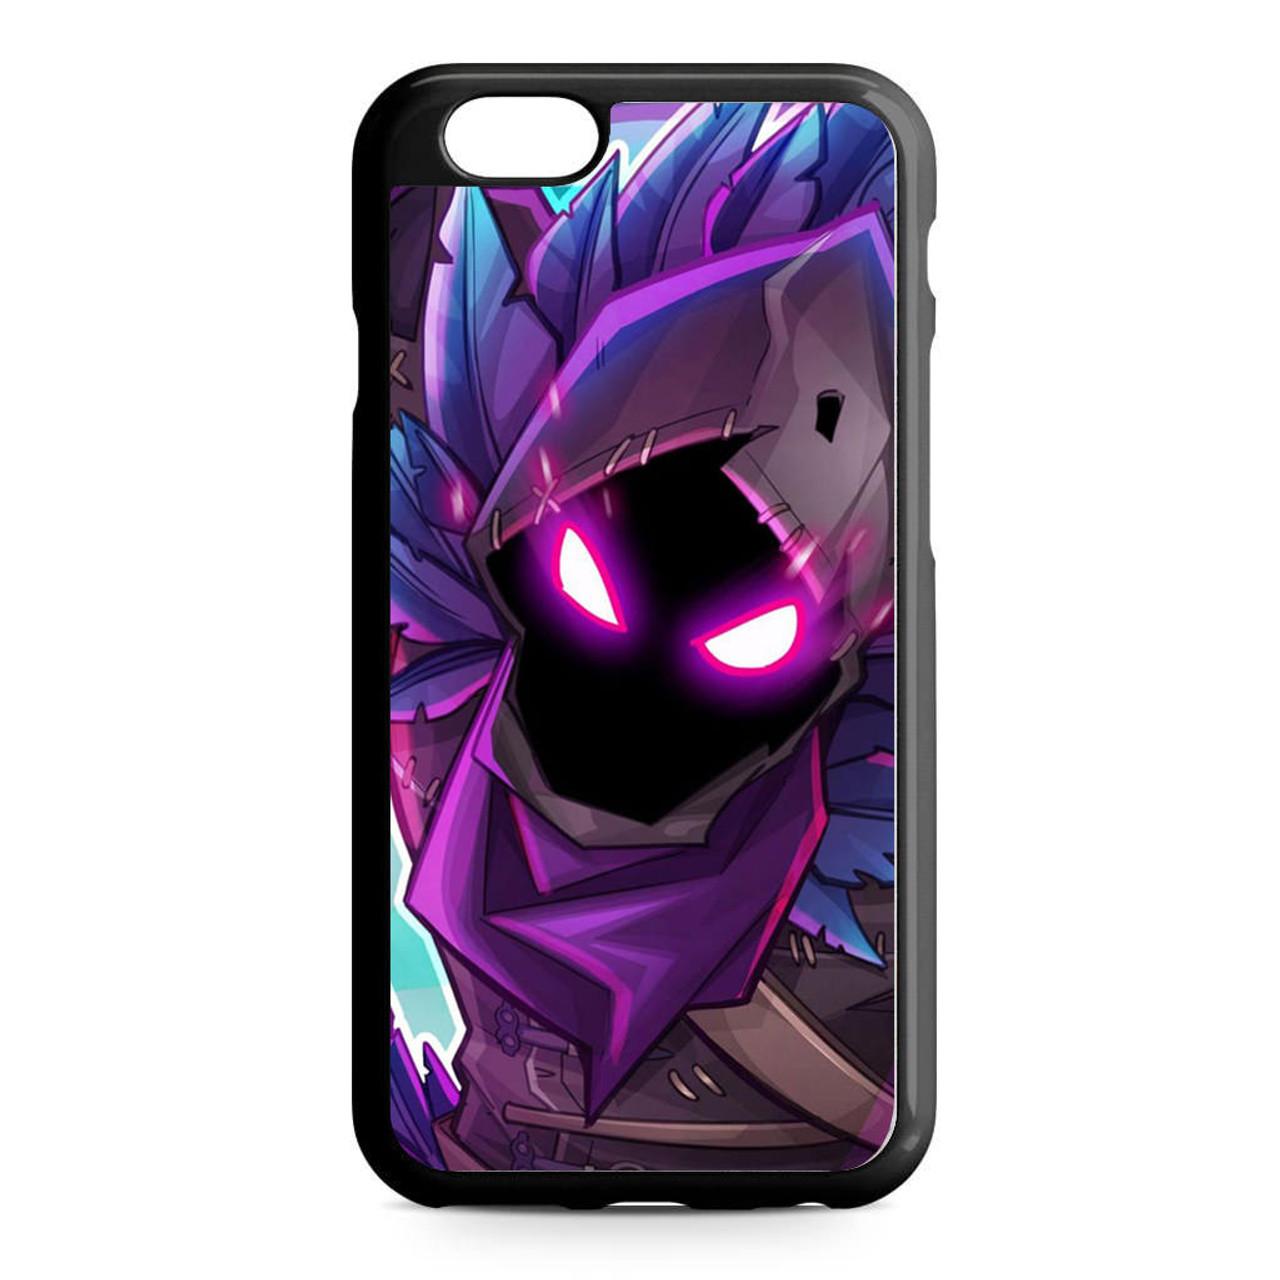 size 40 38027 93fc2 Fortnite Raven iPhone 6/6S Case